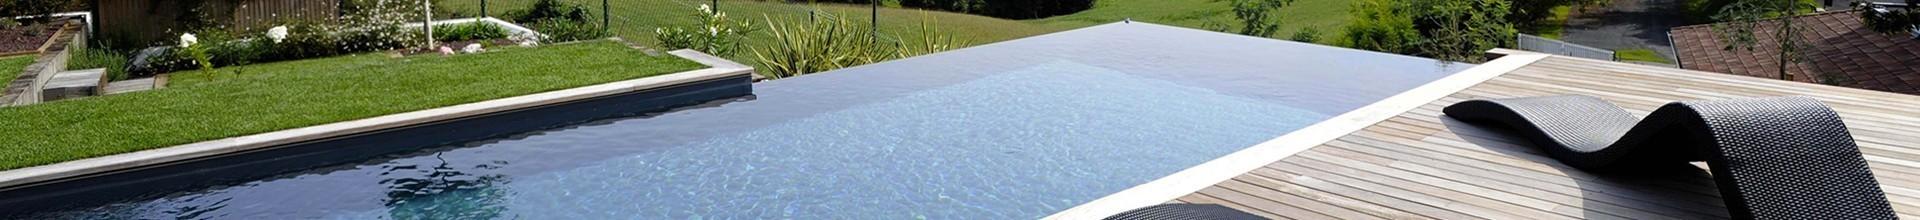 Constructeur piscine discount Pays : Italie